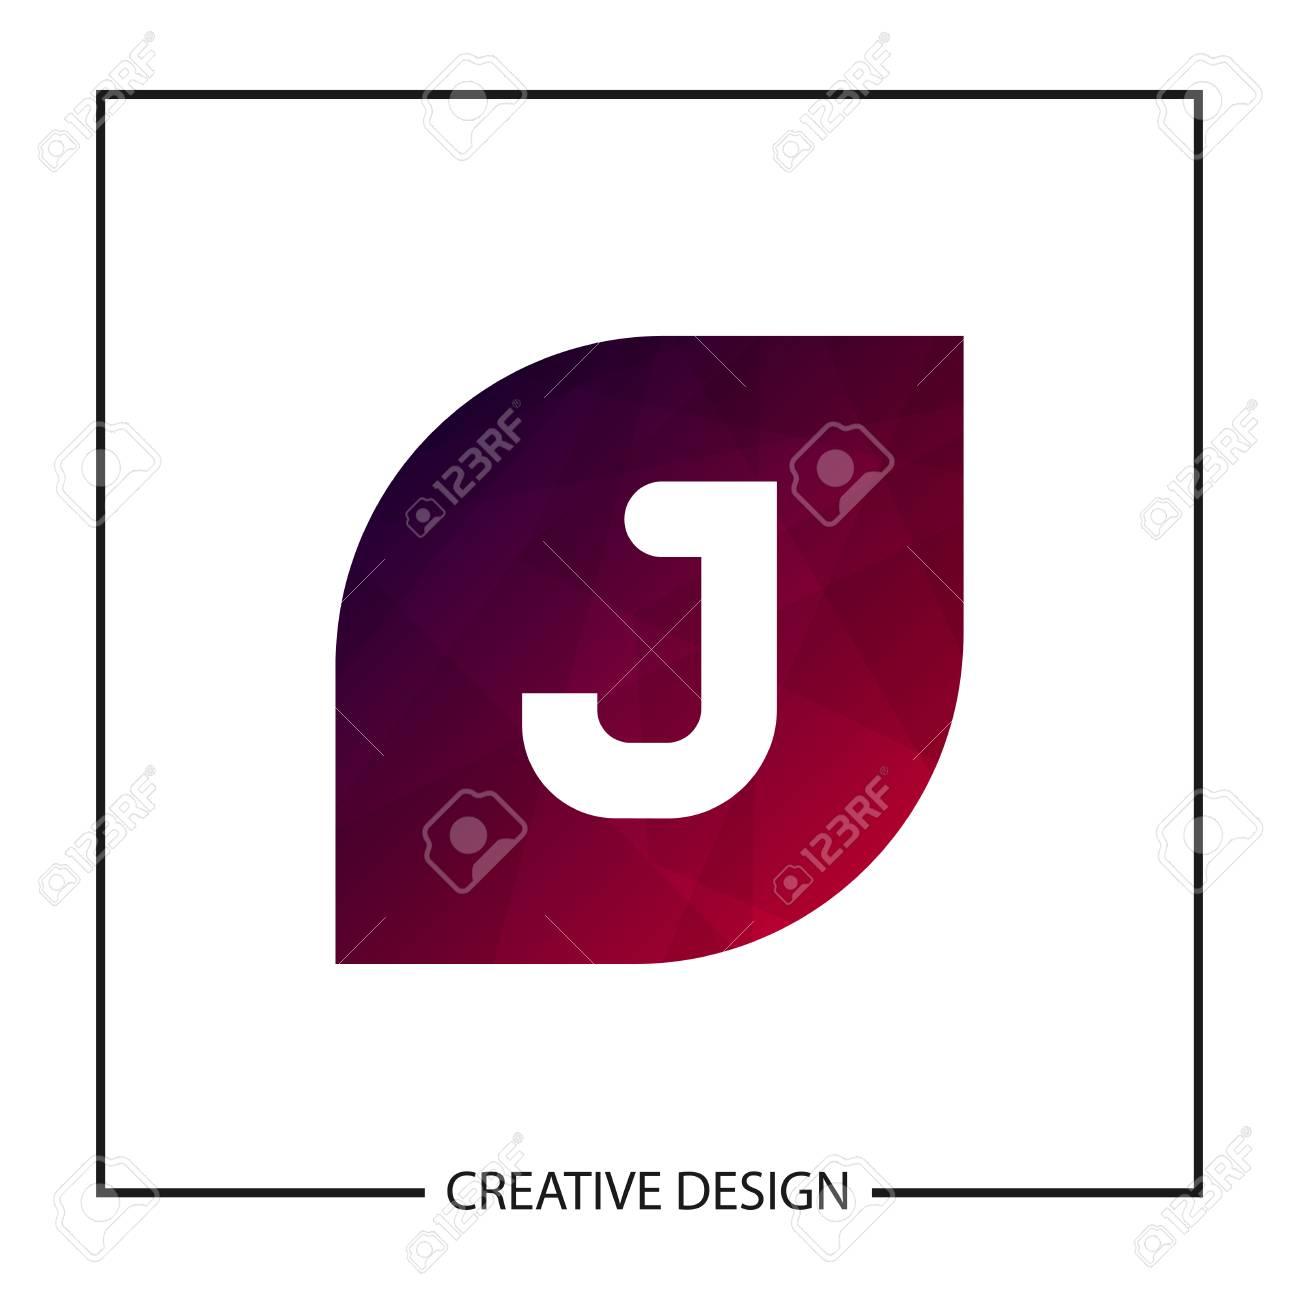 Initial Letter J Template Vector Design - 112518445